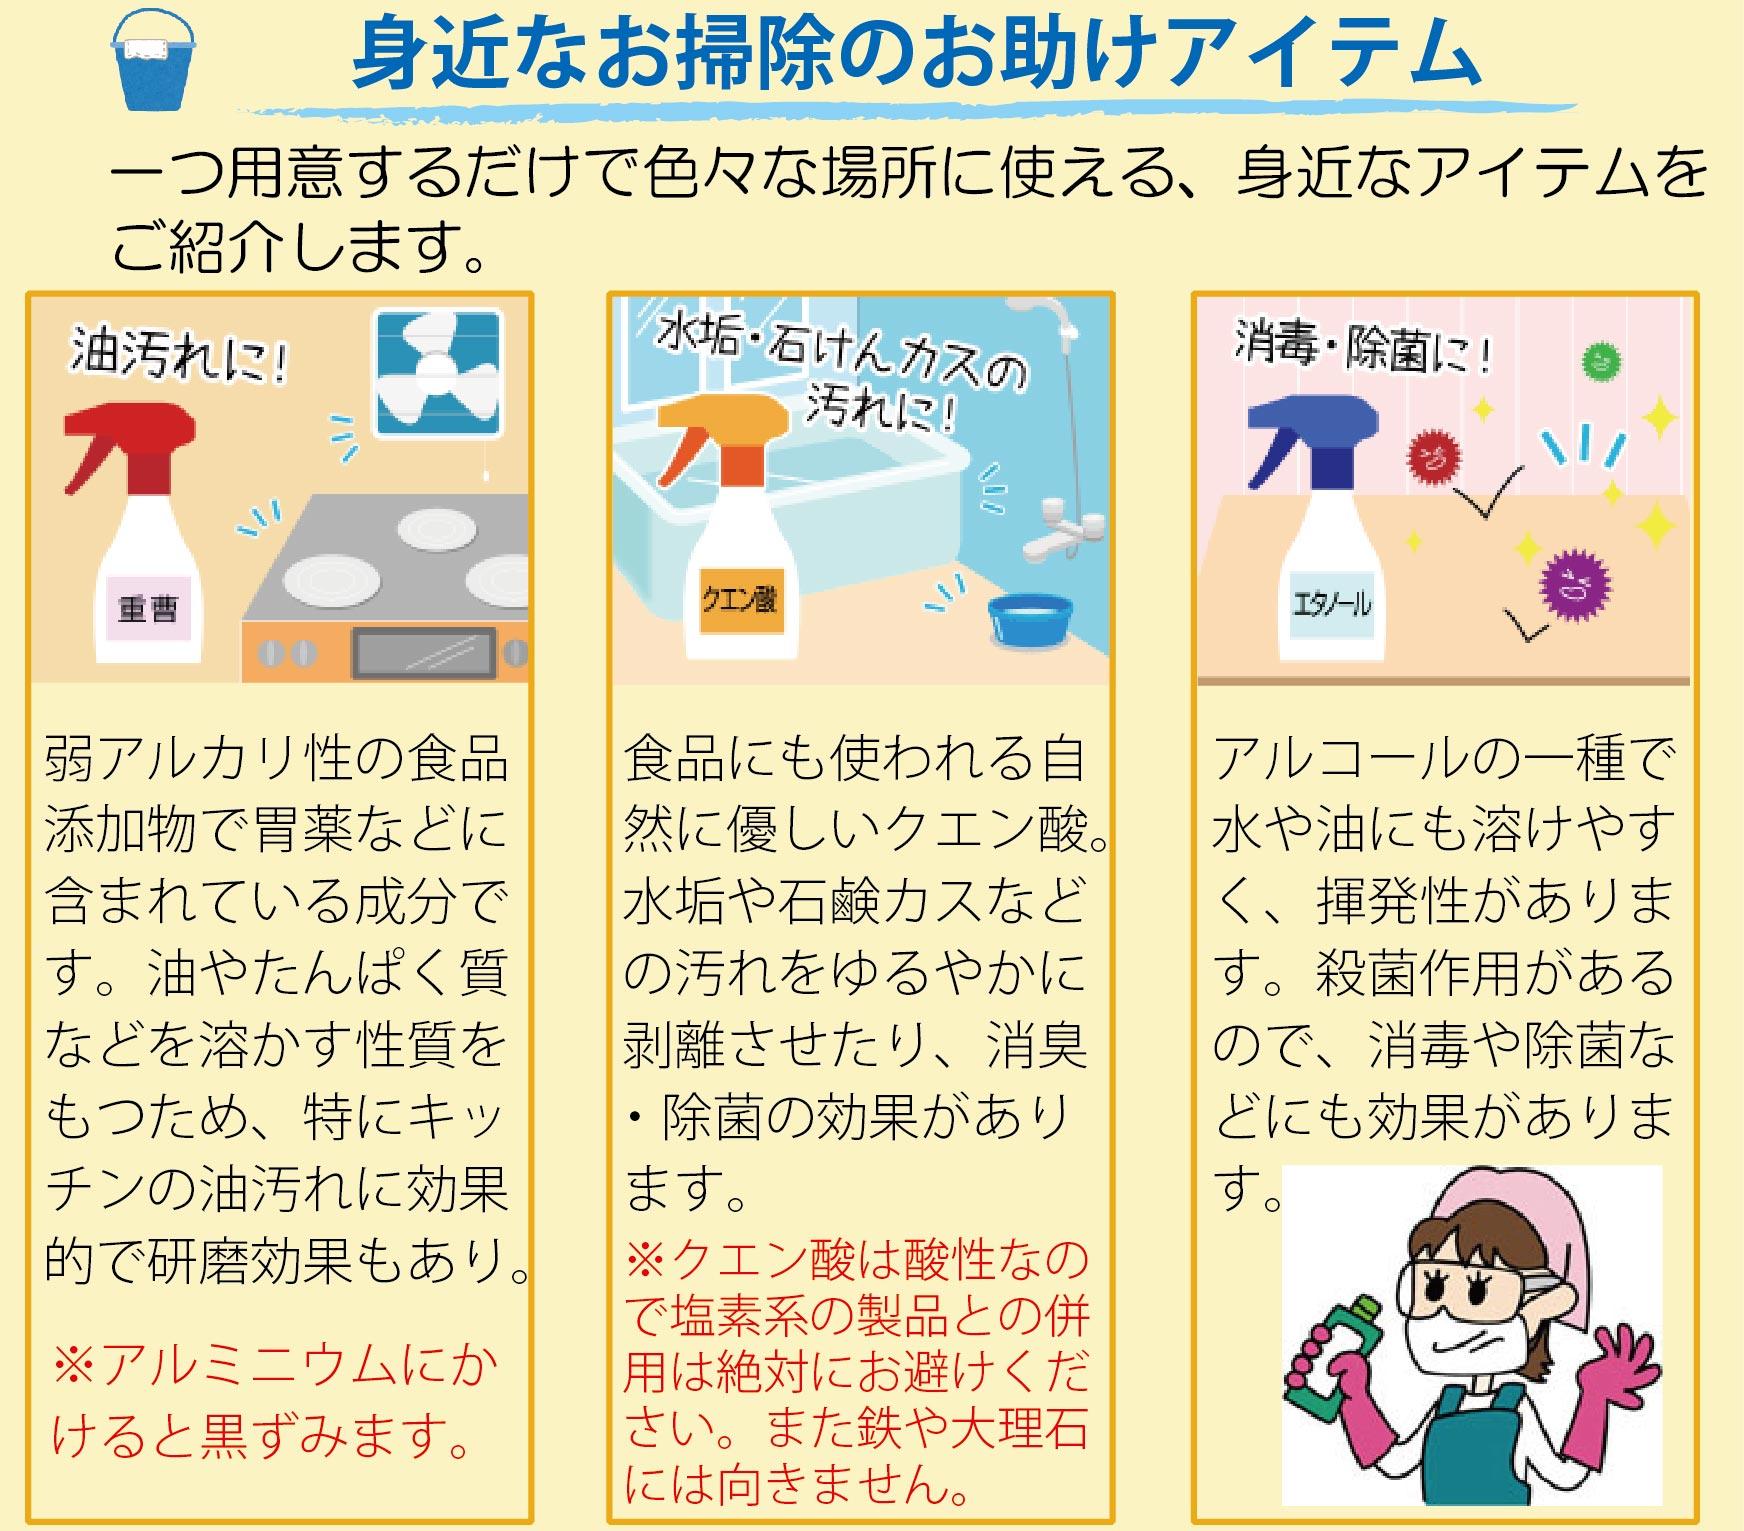 KuraSi-natu-sin90-10.jpg